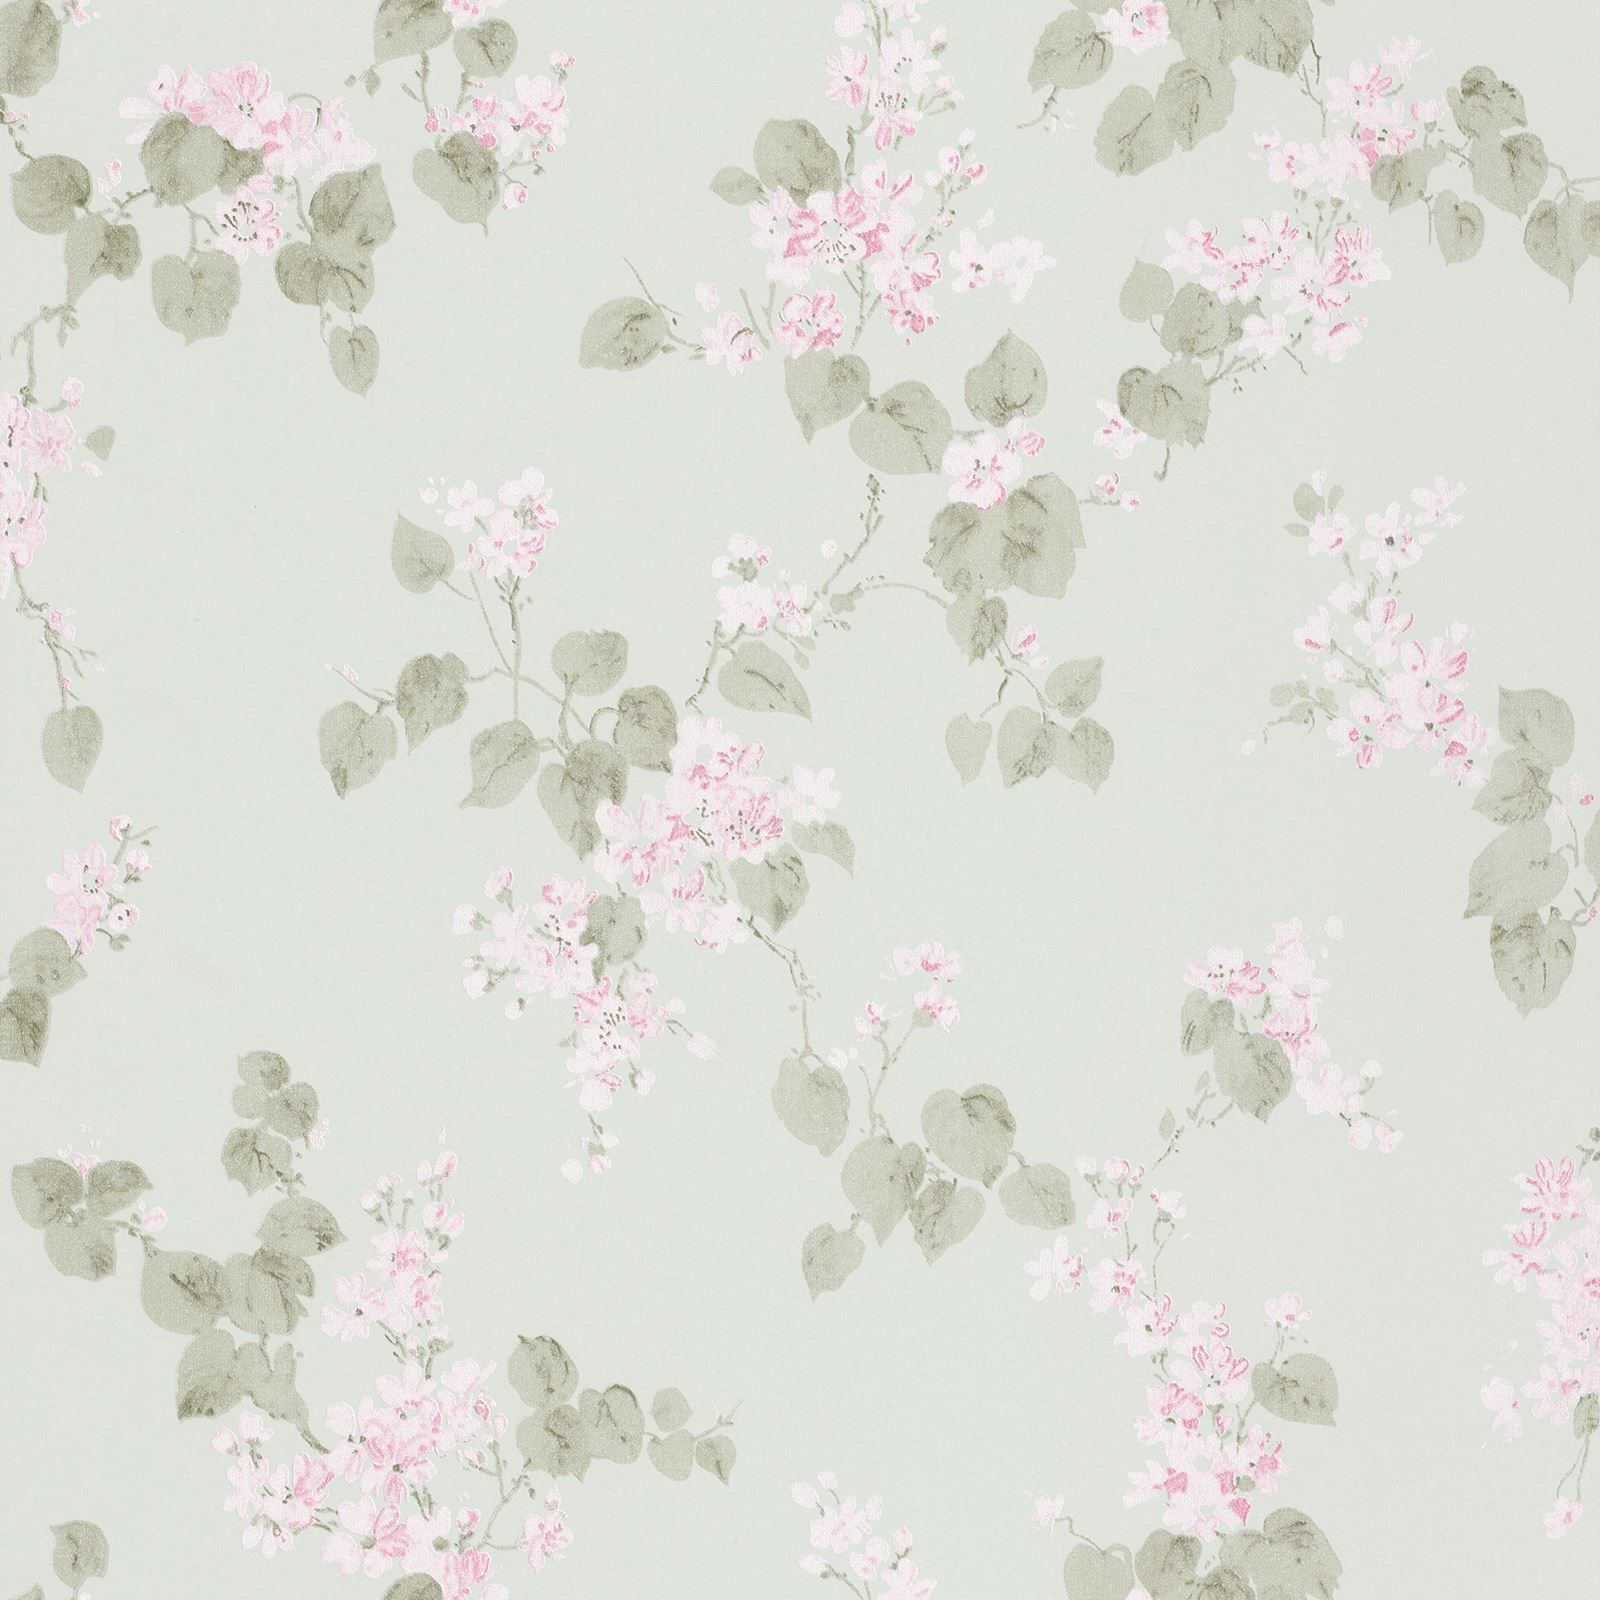 Details About Rasch Emilia Blossom Floral Wallpaper Metallic